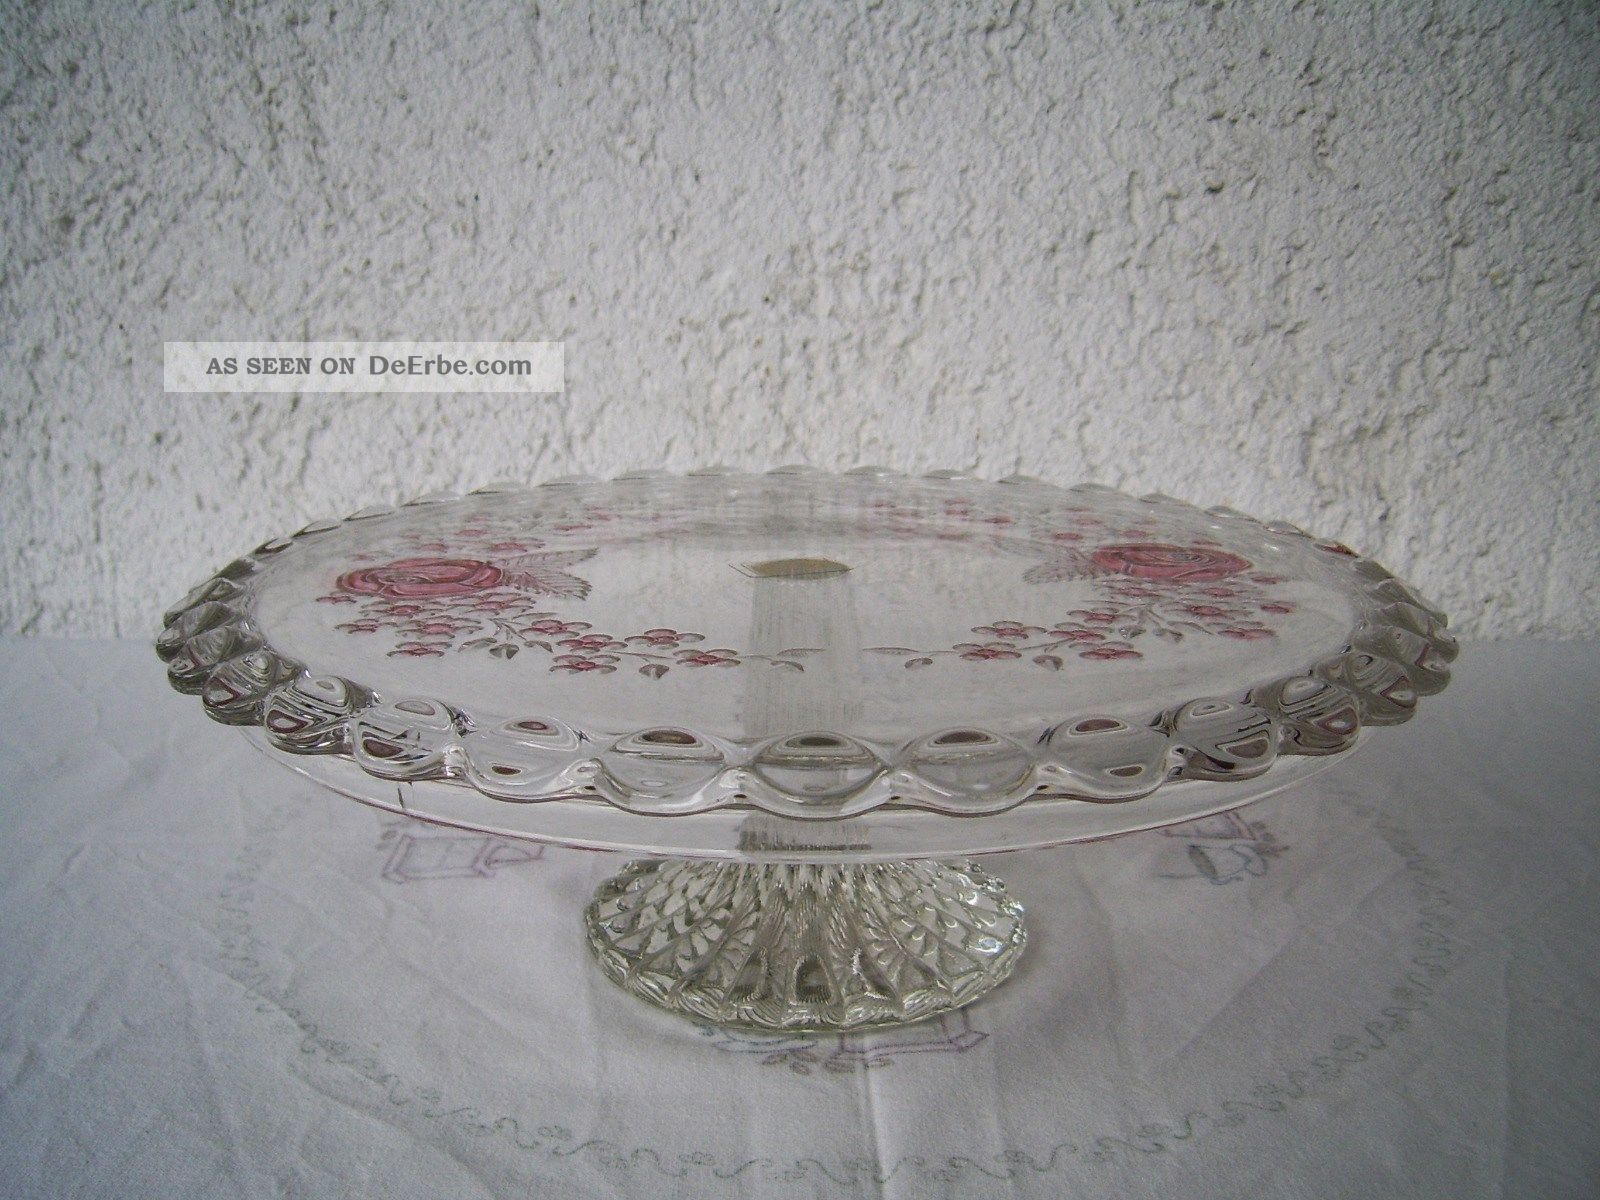 dekorative walther kristallglas tortenplatte hoher fu. Black Bedroom Furniture Sets. Home Design Ideas